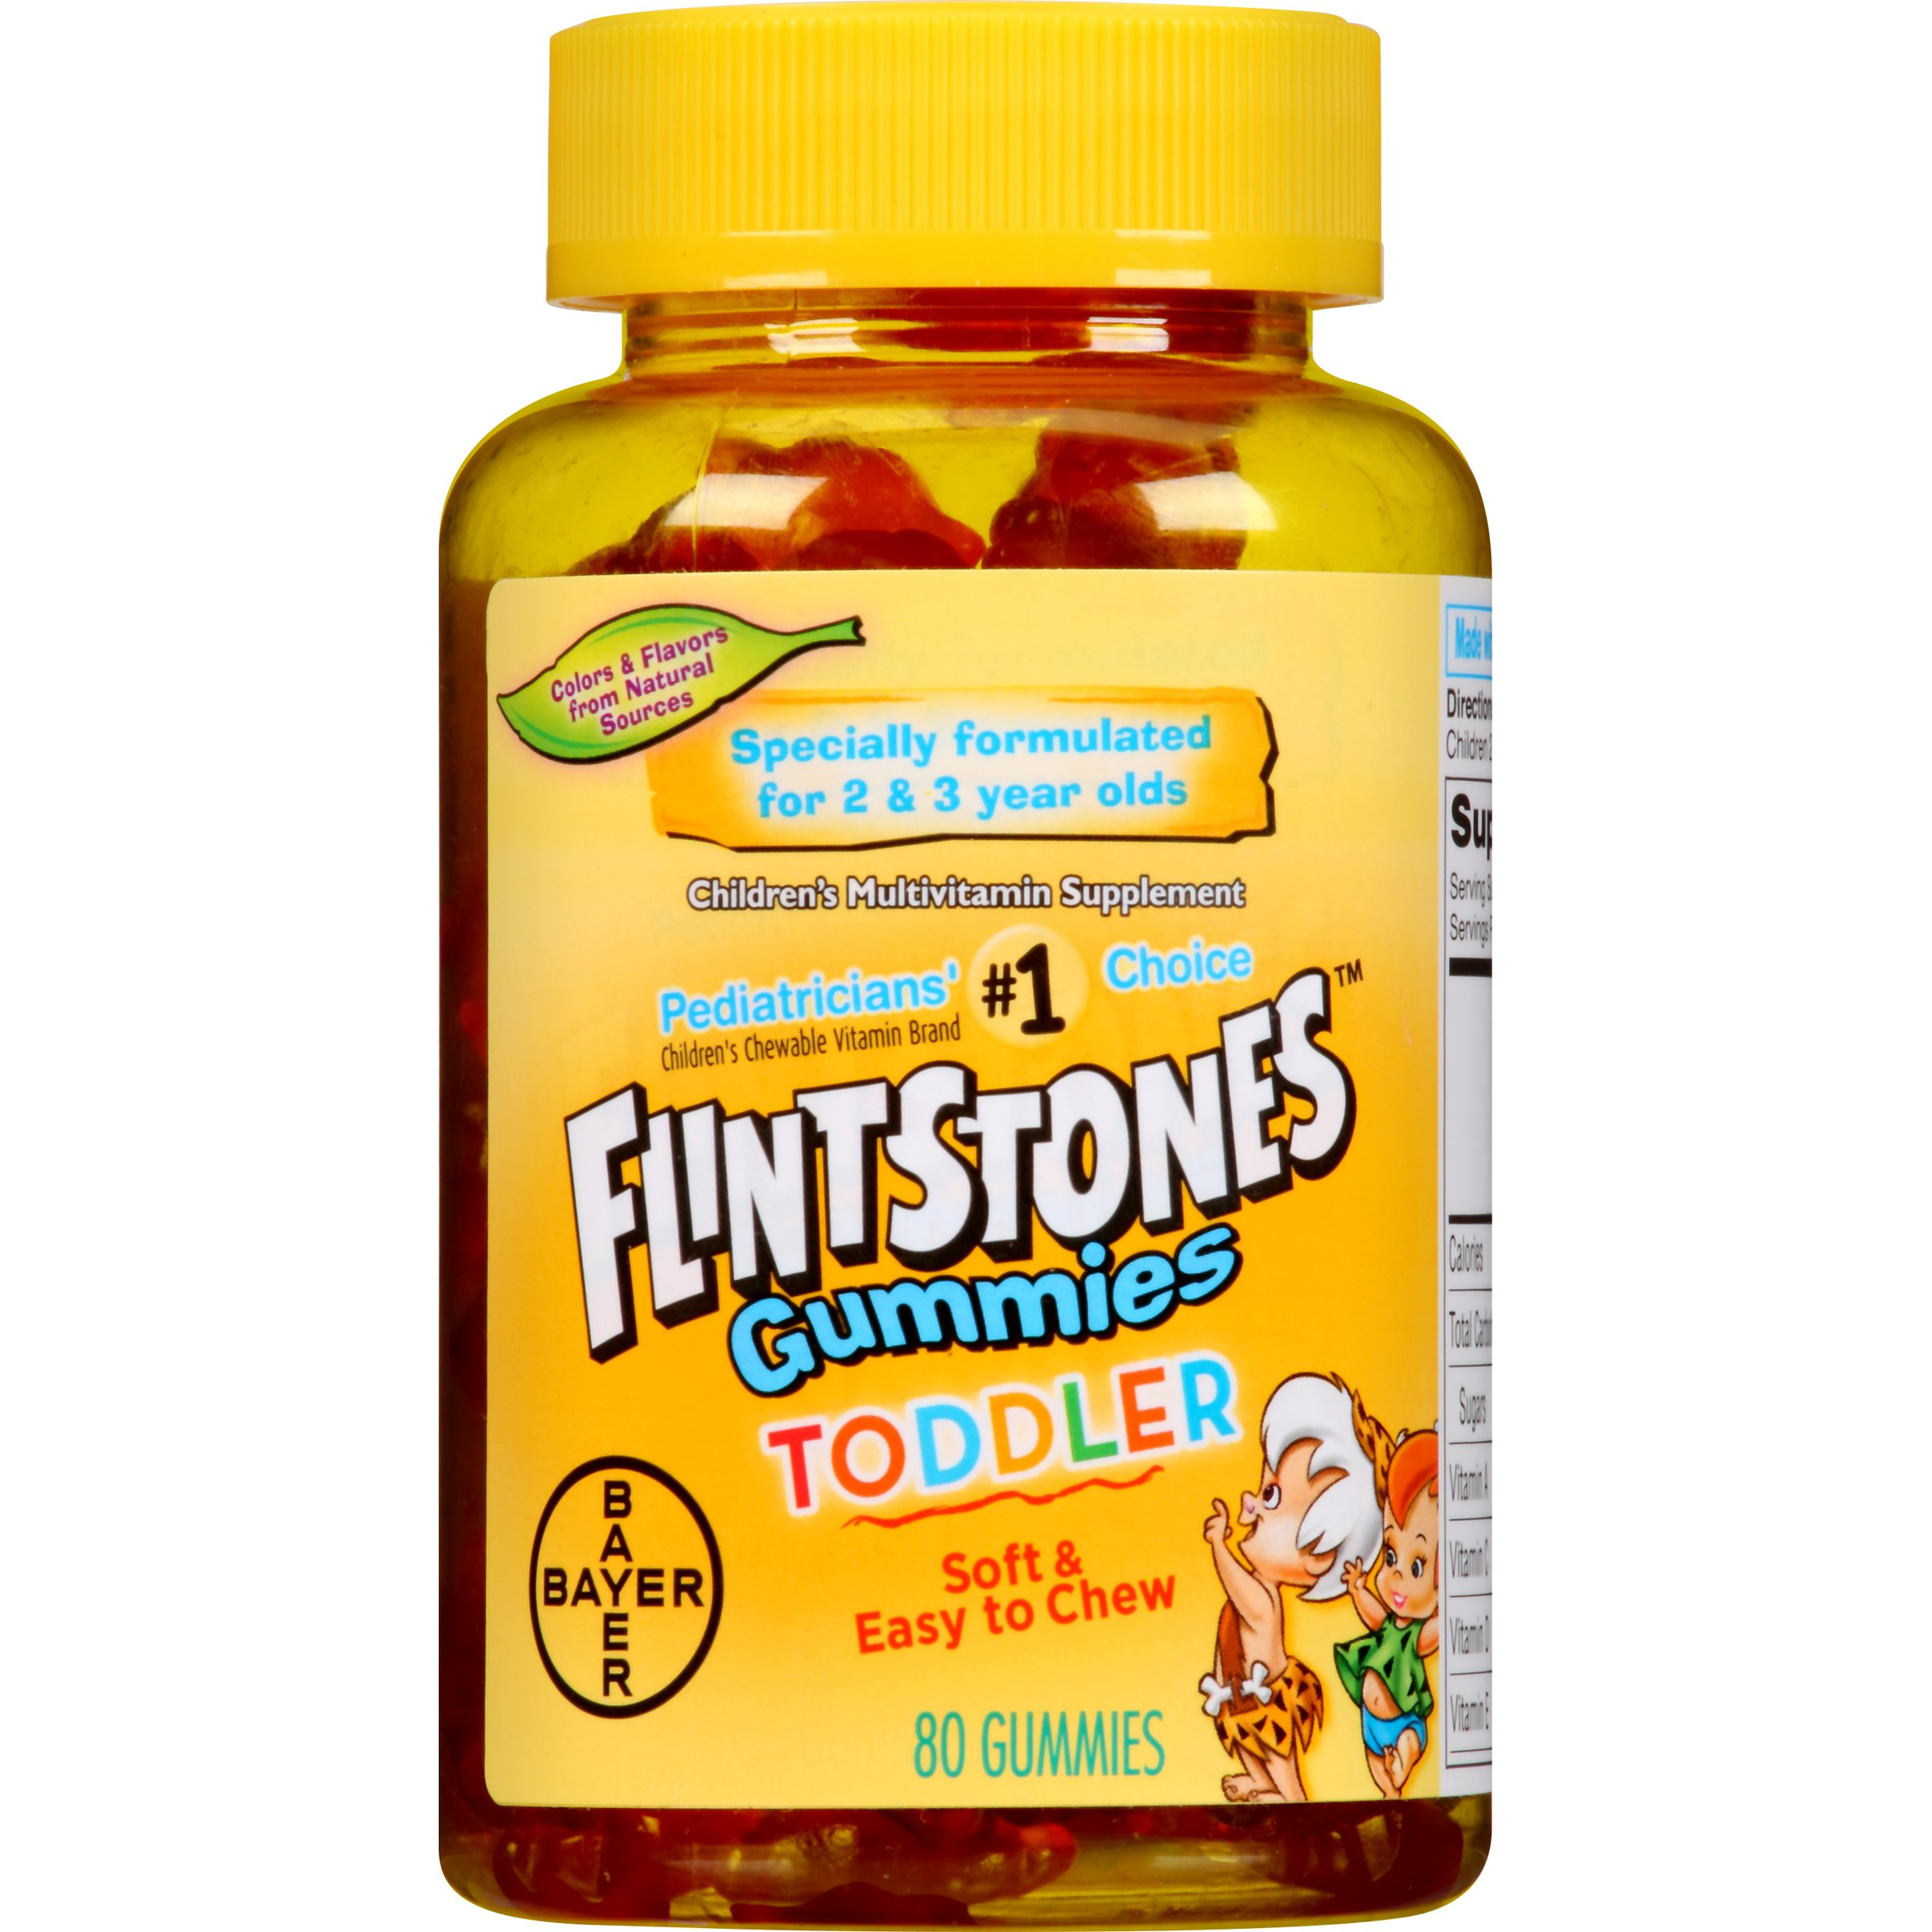 Flintstones Toddler Multivitamin Supplement Vitamins